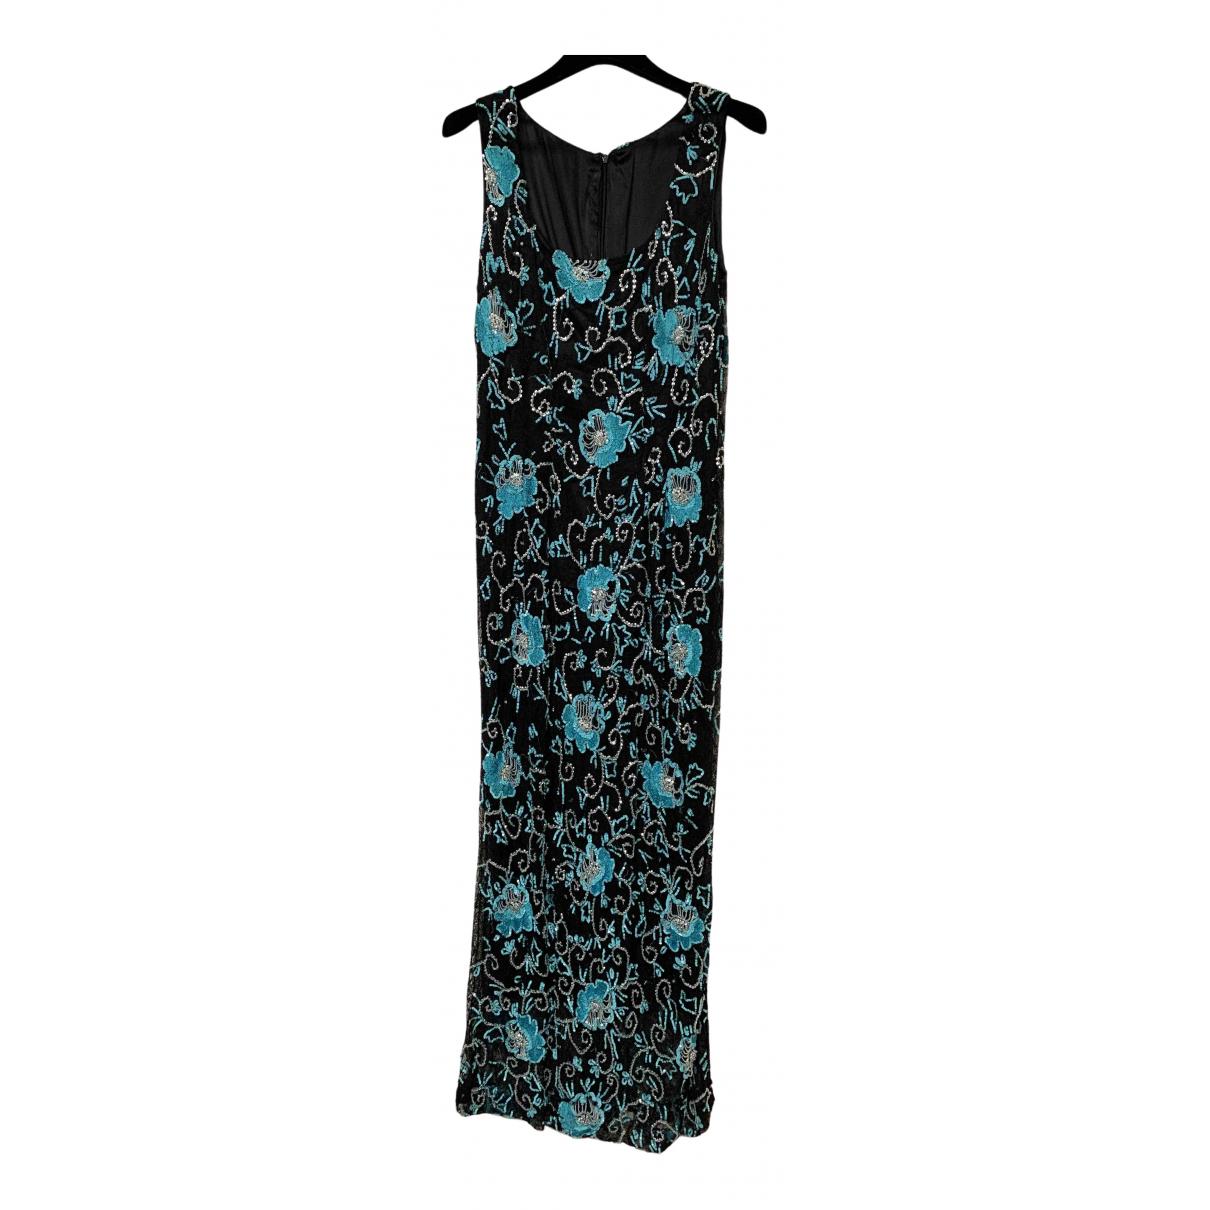 Dolce & Gabbana \N Black Glitter dress for Women 46 IT